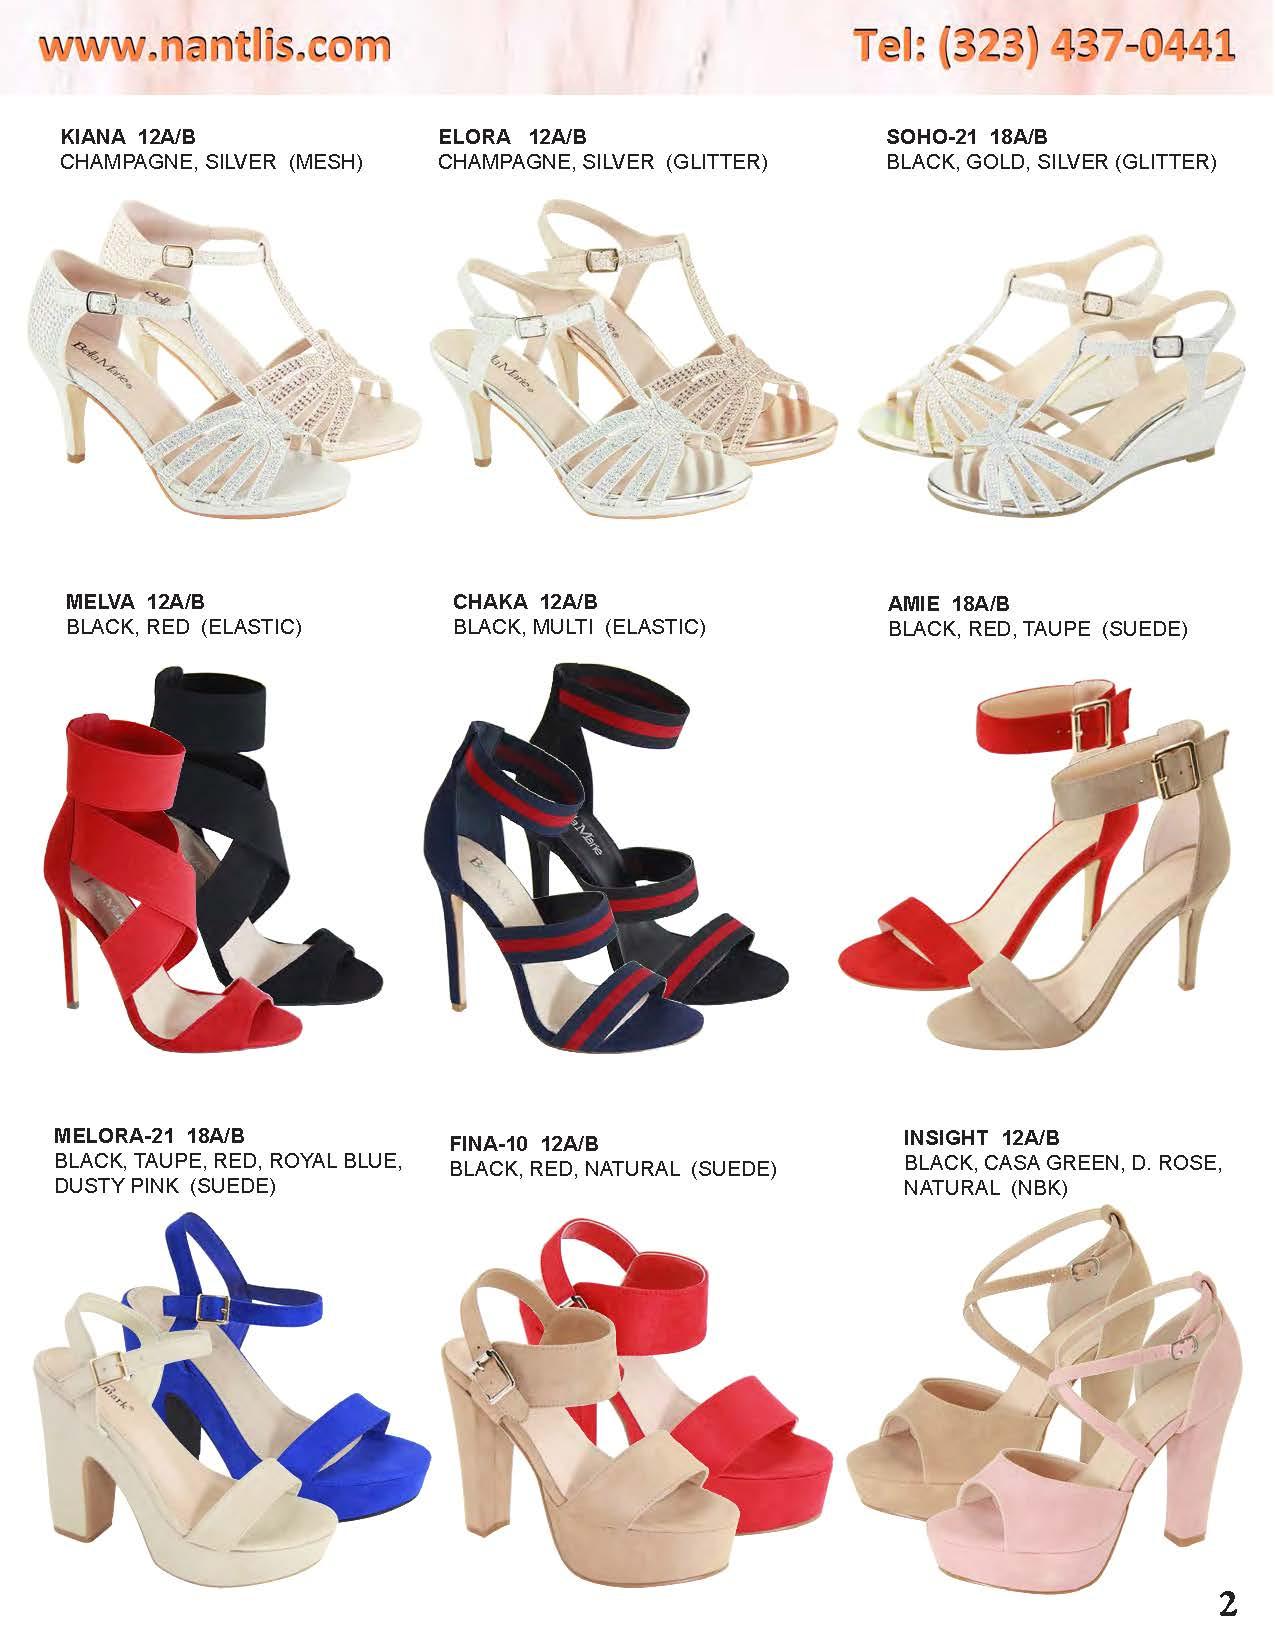 537b016b Nantlis Catalogo Zapatos de Mujer mayoreo Vol 1 Wholesale womens  Shoes_Page_03